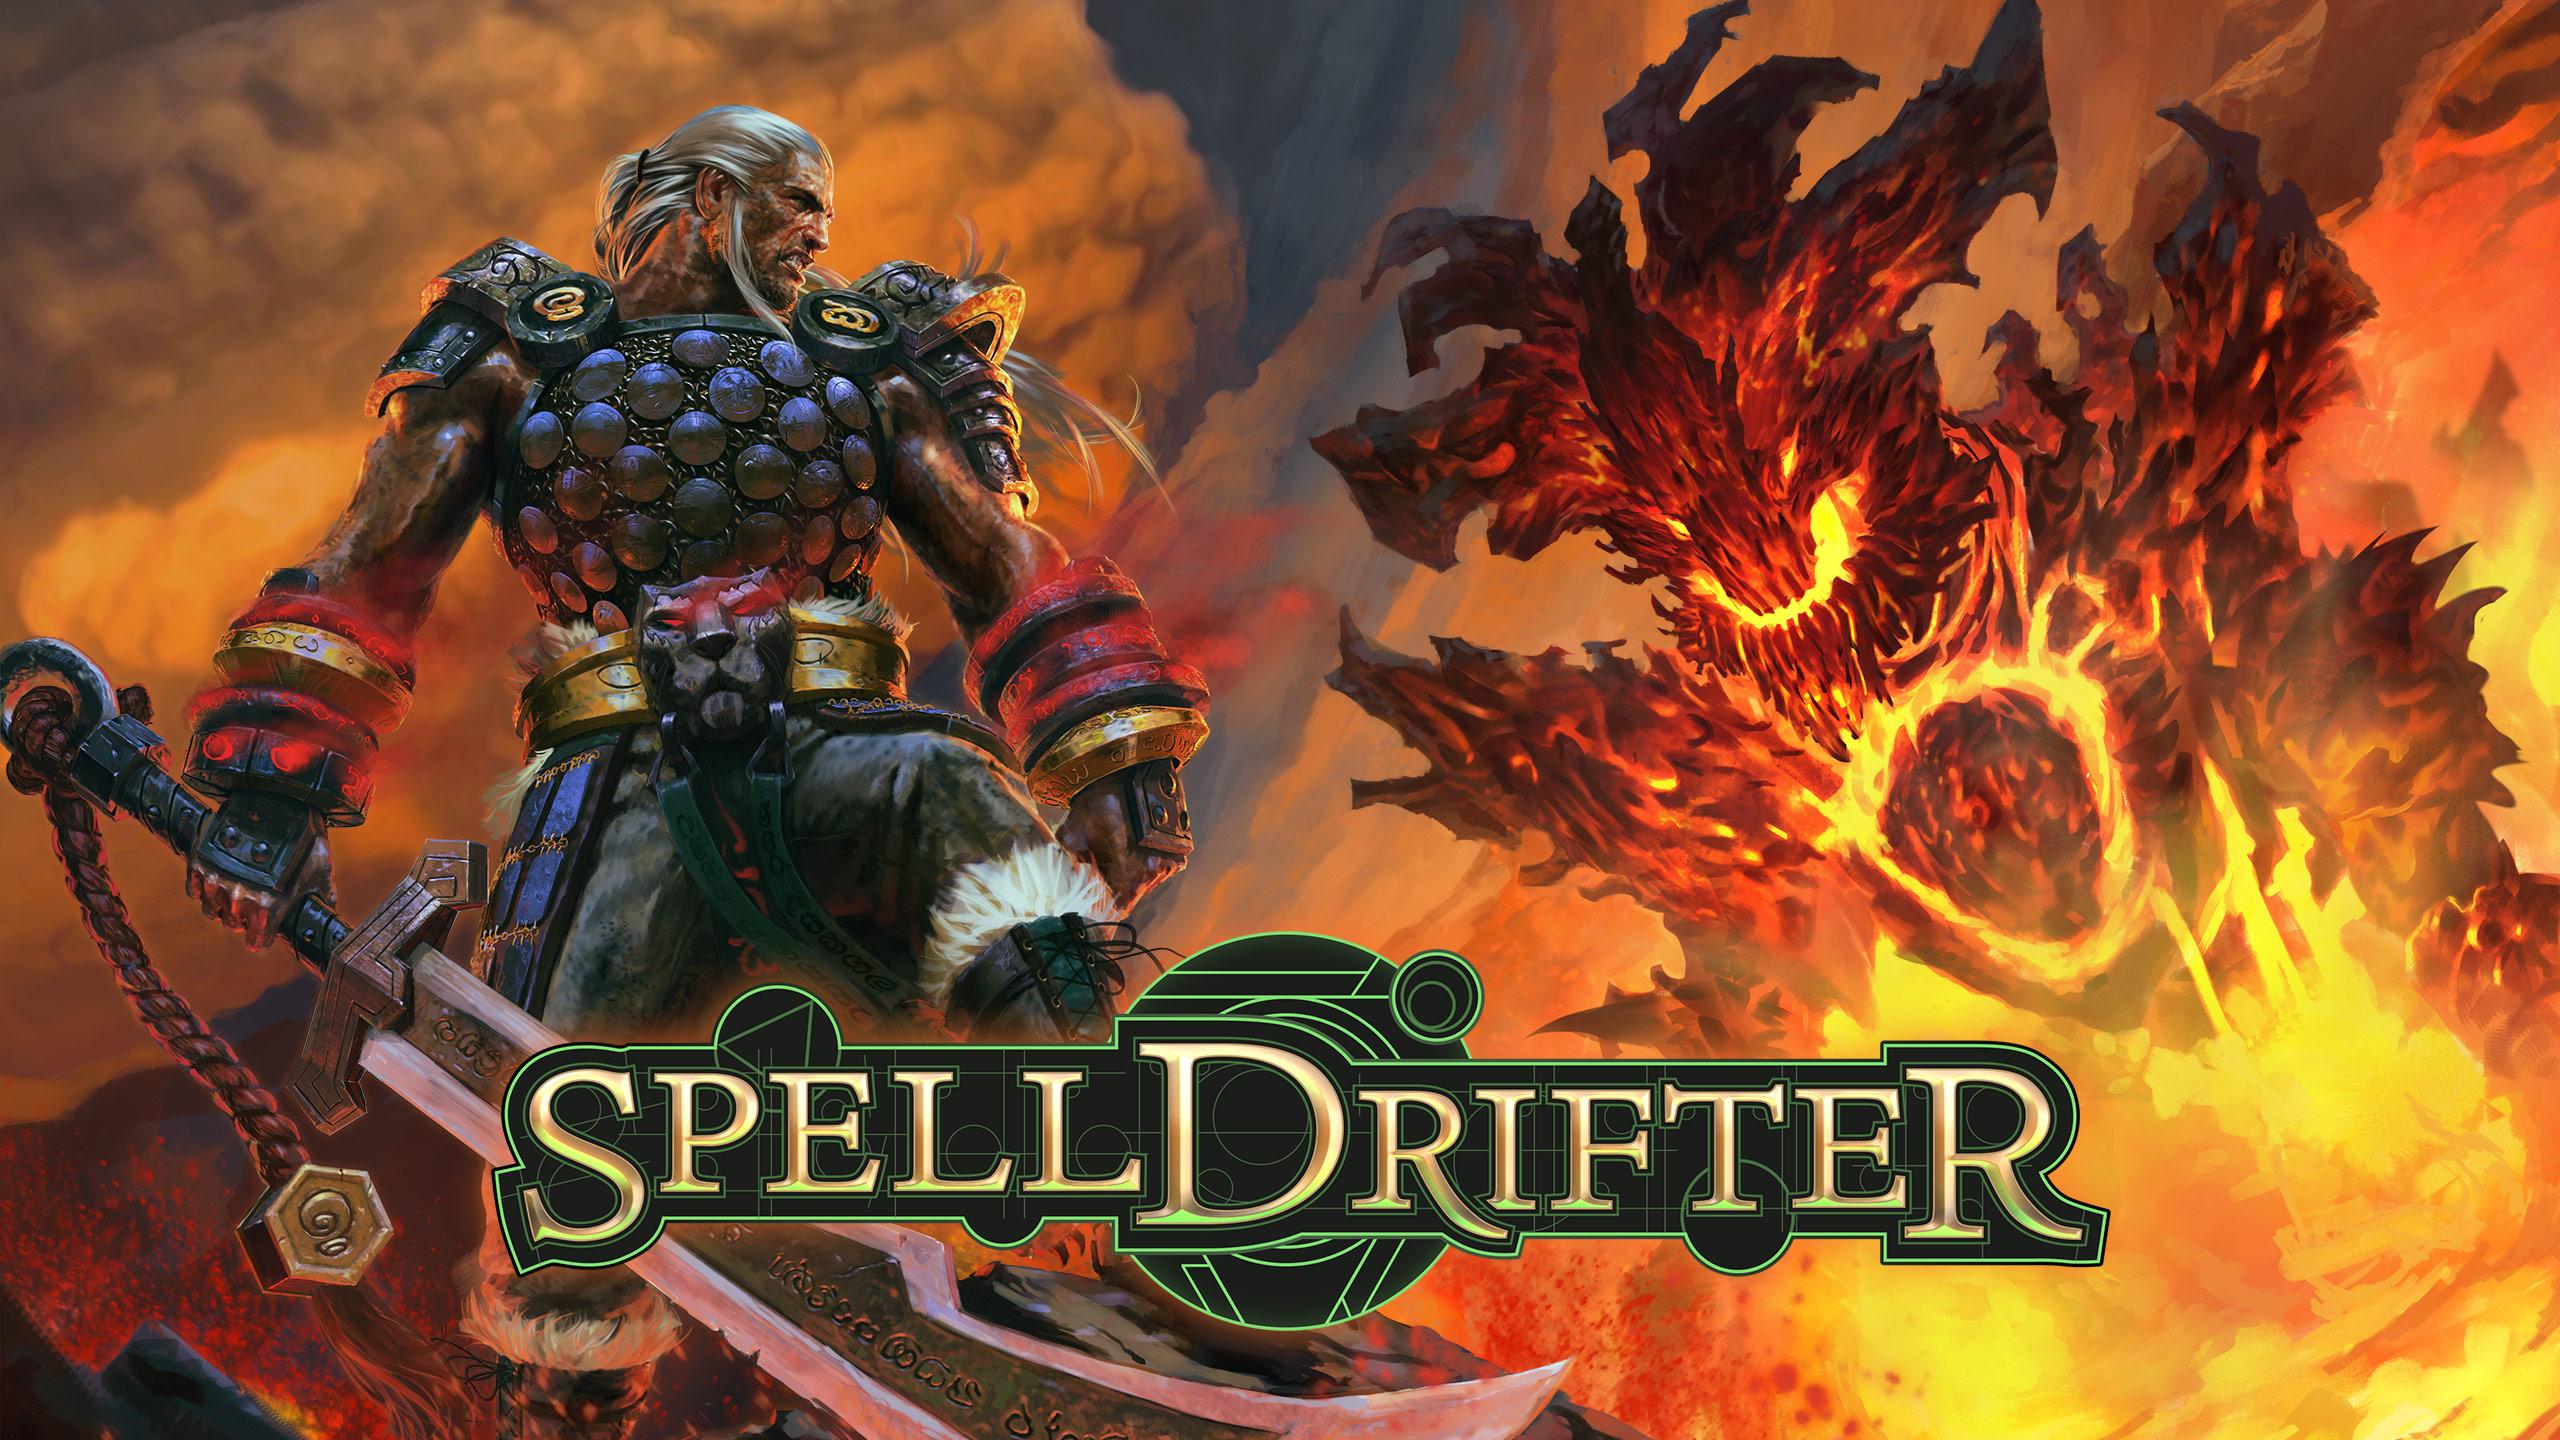 Spelldrifter   Descárgalo y cómpralo hoy - Epic Games Store